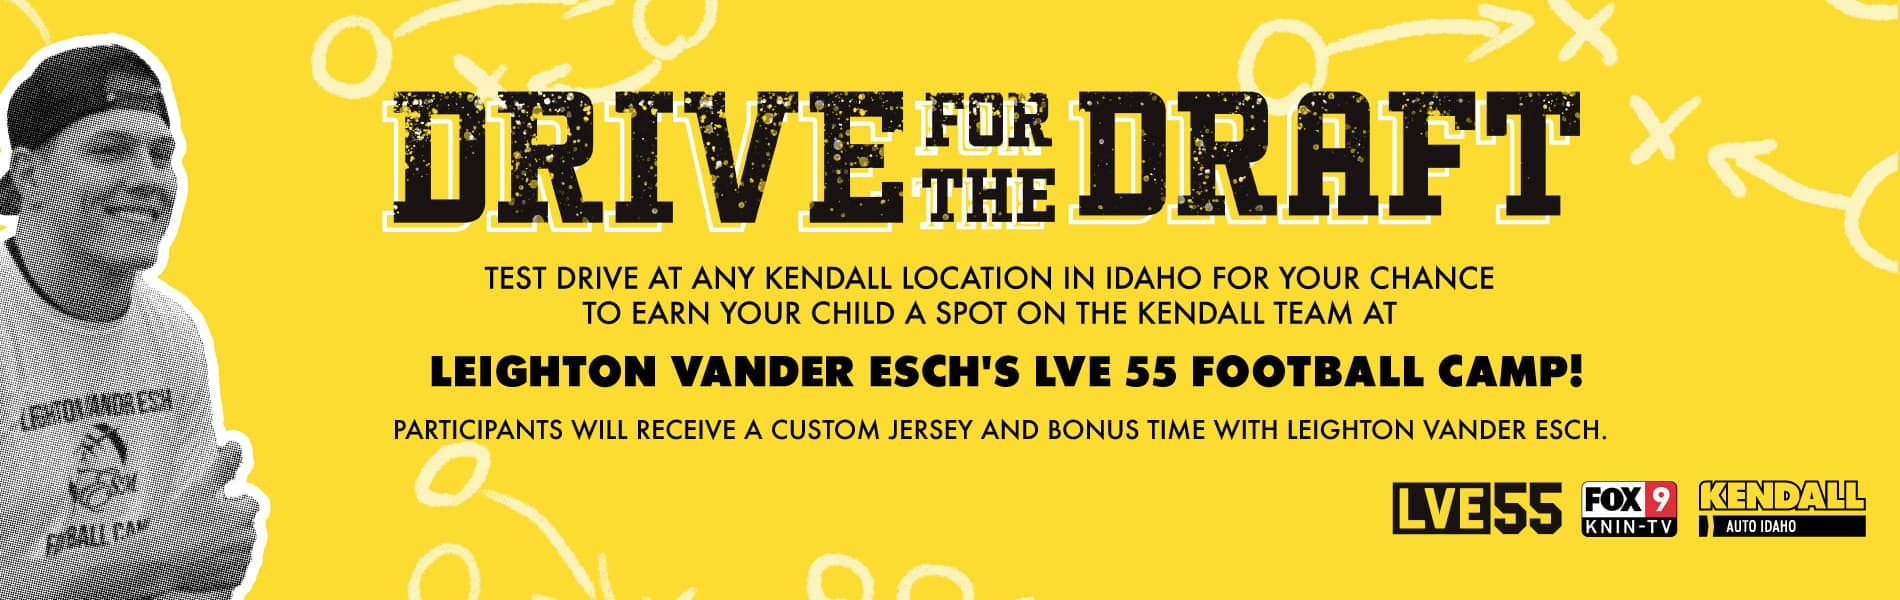 Drive for the Draft - NFL Linebacker Leighton Vander Esch's Football Camp